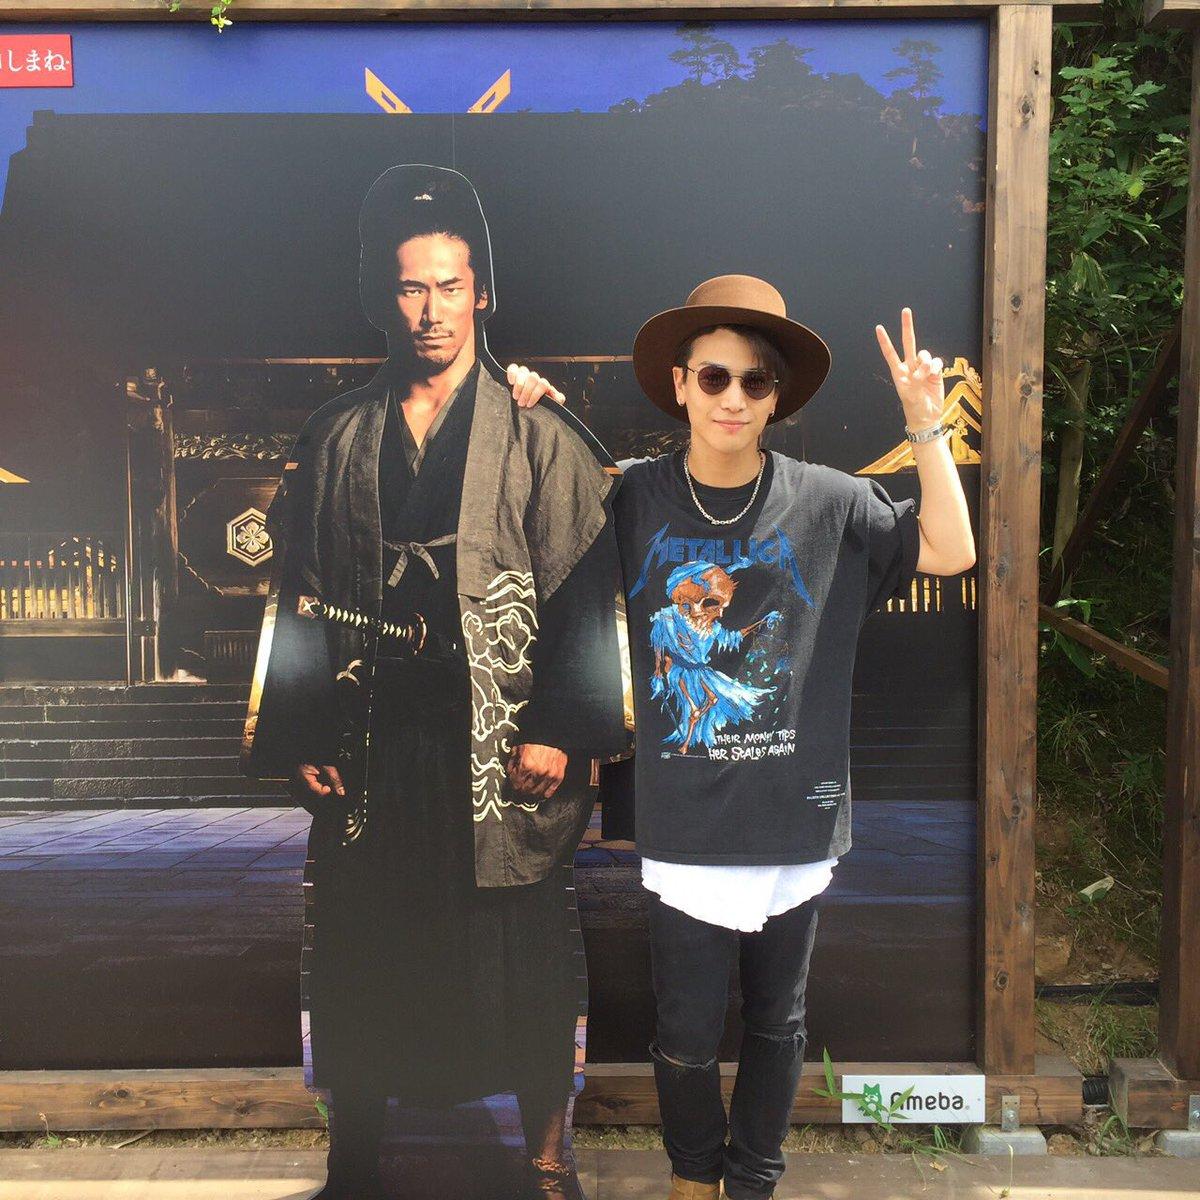 EXILE/三代目 J Soul Brothers 岩田剛典(がんちゃん) 出雲たたら村